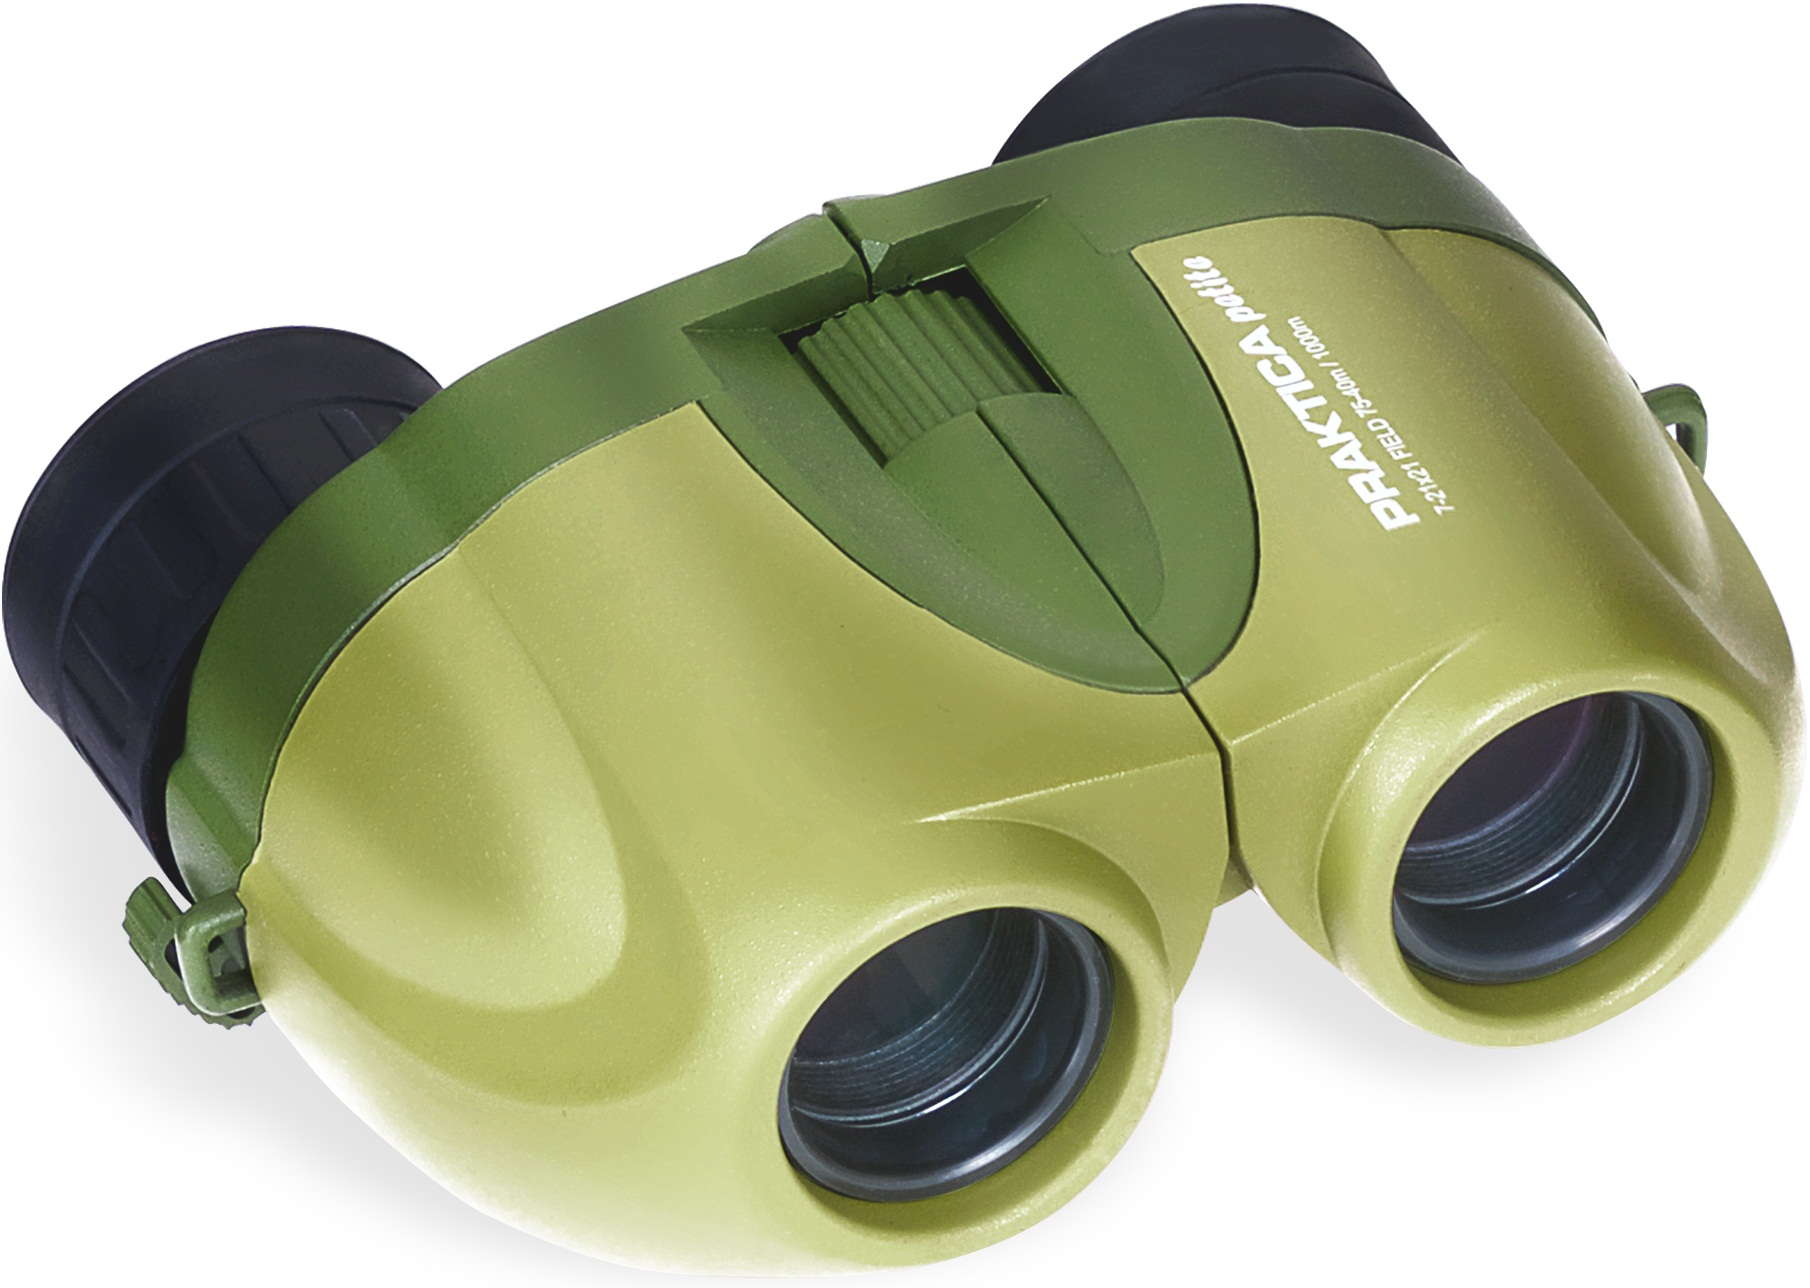 Praktica petite mm binoculars green z £ london